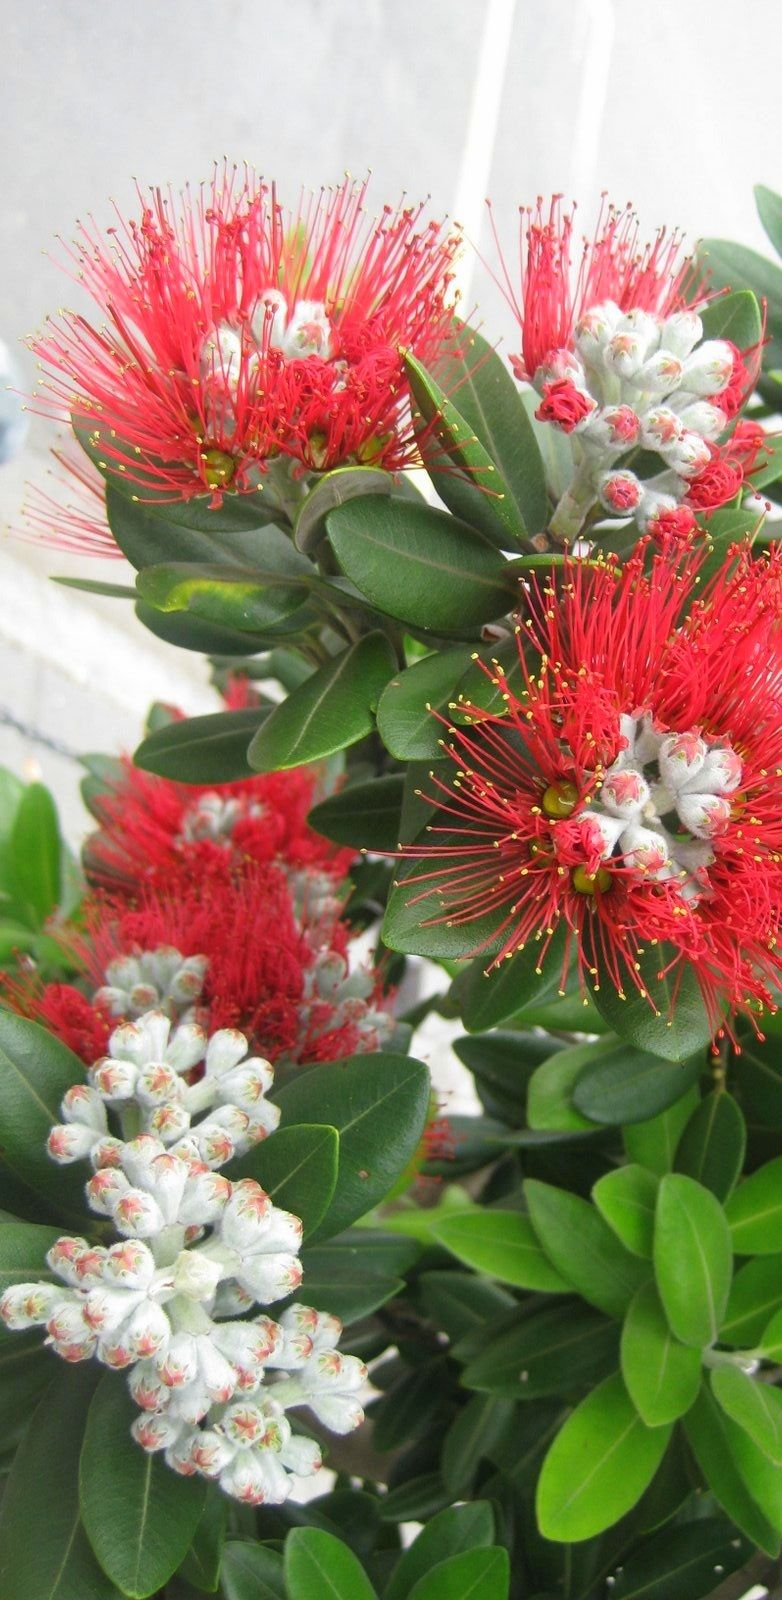 Pin on Flower Species